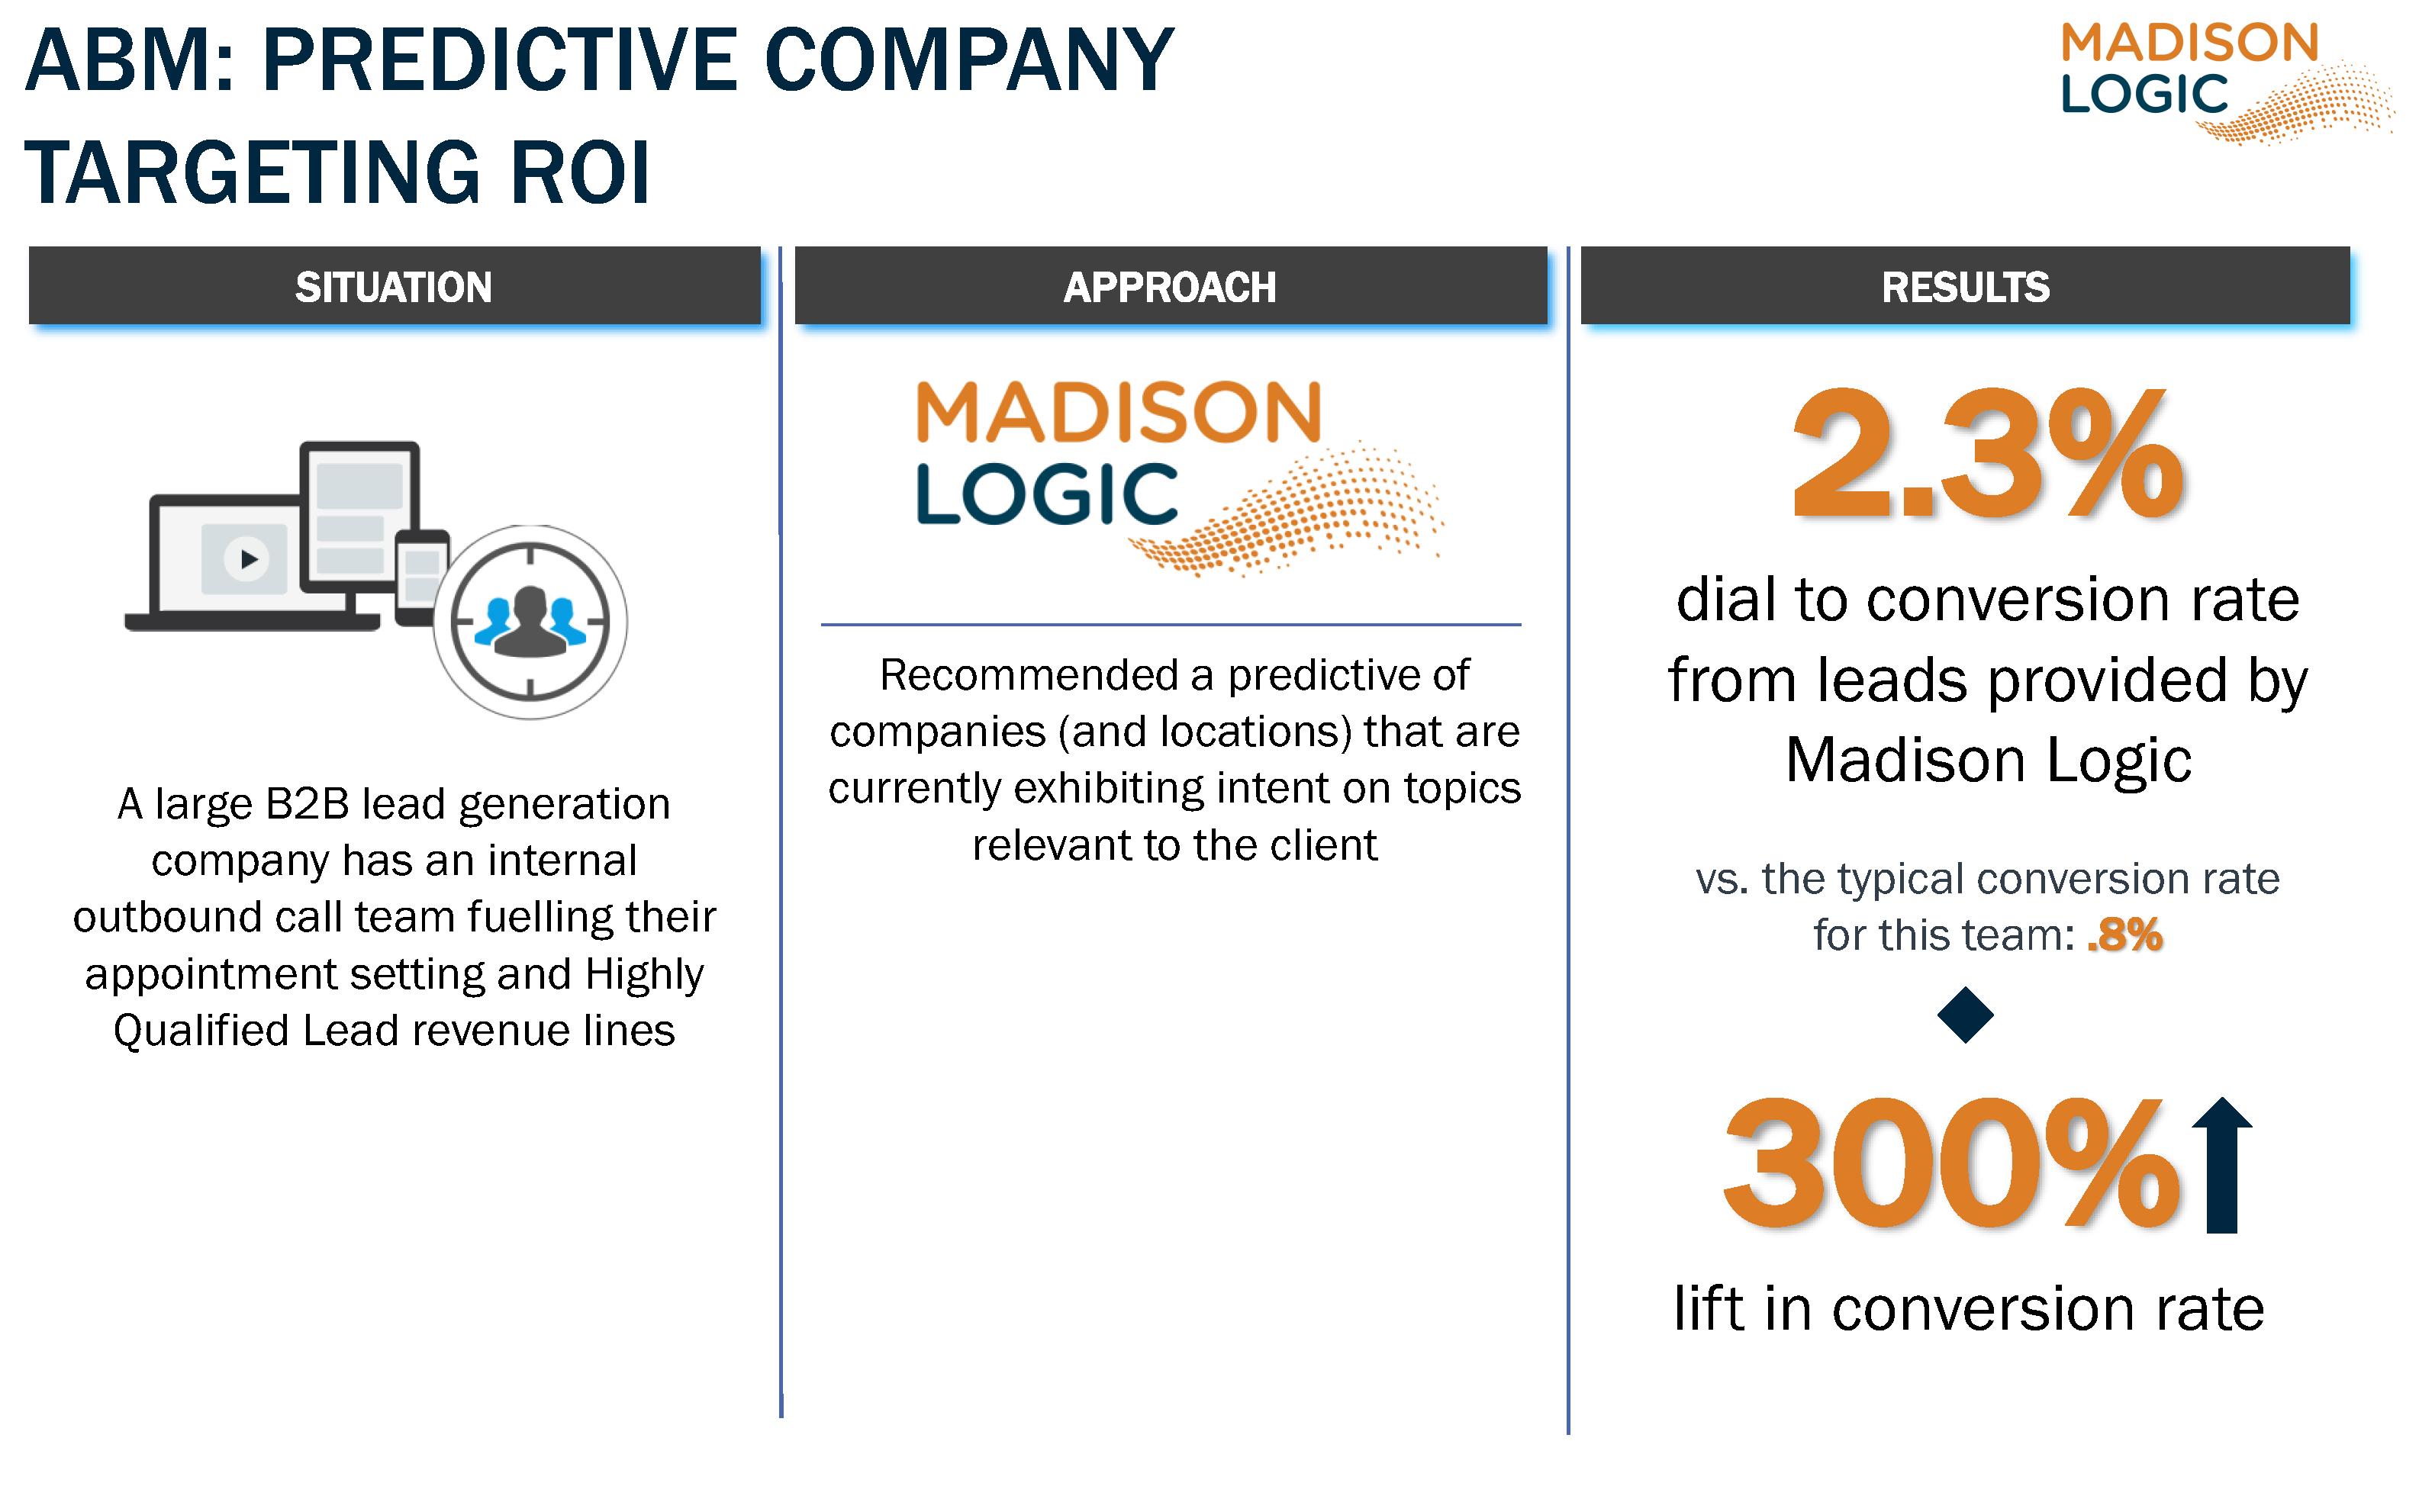 ABM Predictive Company Targeting ROI